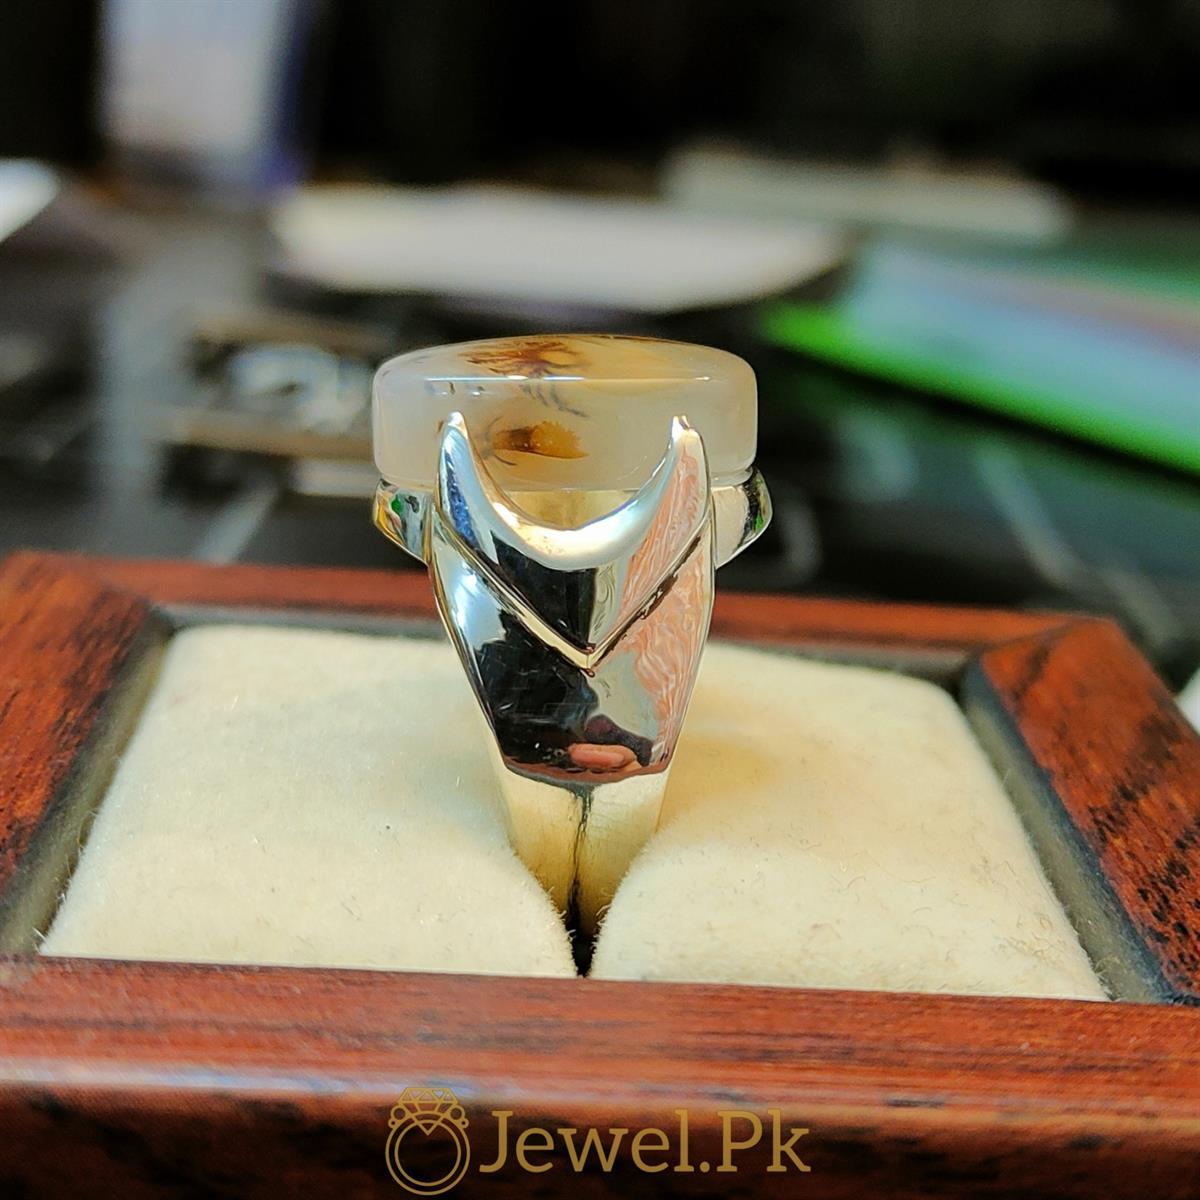 Natural Yemeni Agate Yamni Aqeeq Aiqi Haqiq ring 5 natural gemstones pakistan + 925 silver jewelry online